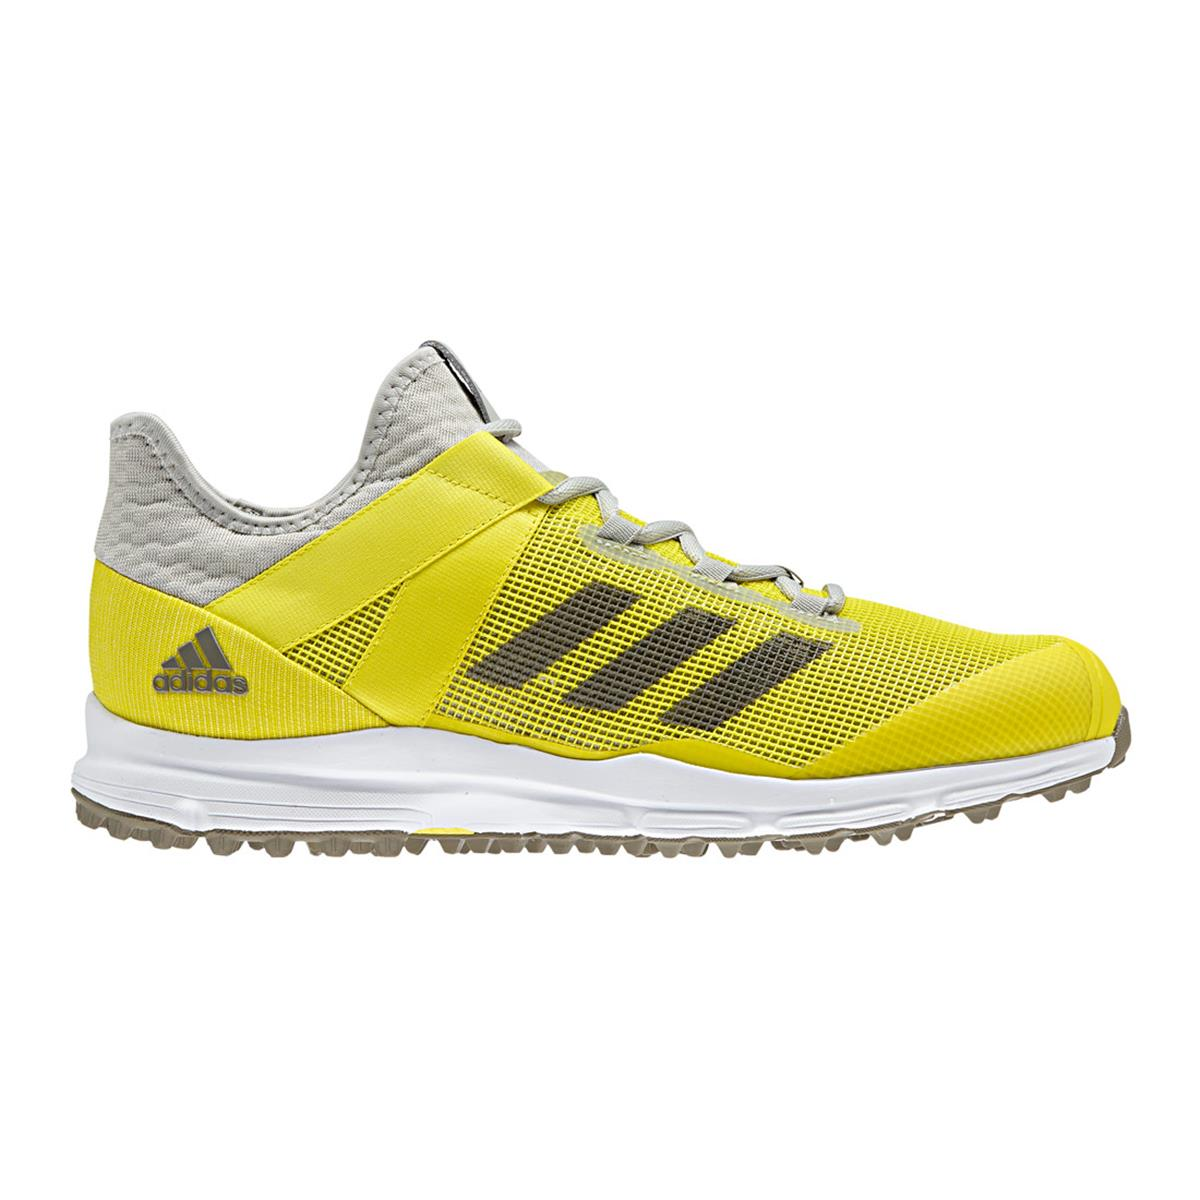 Adidas Zone Dox Hockey Shoes (Yellow